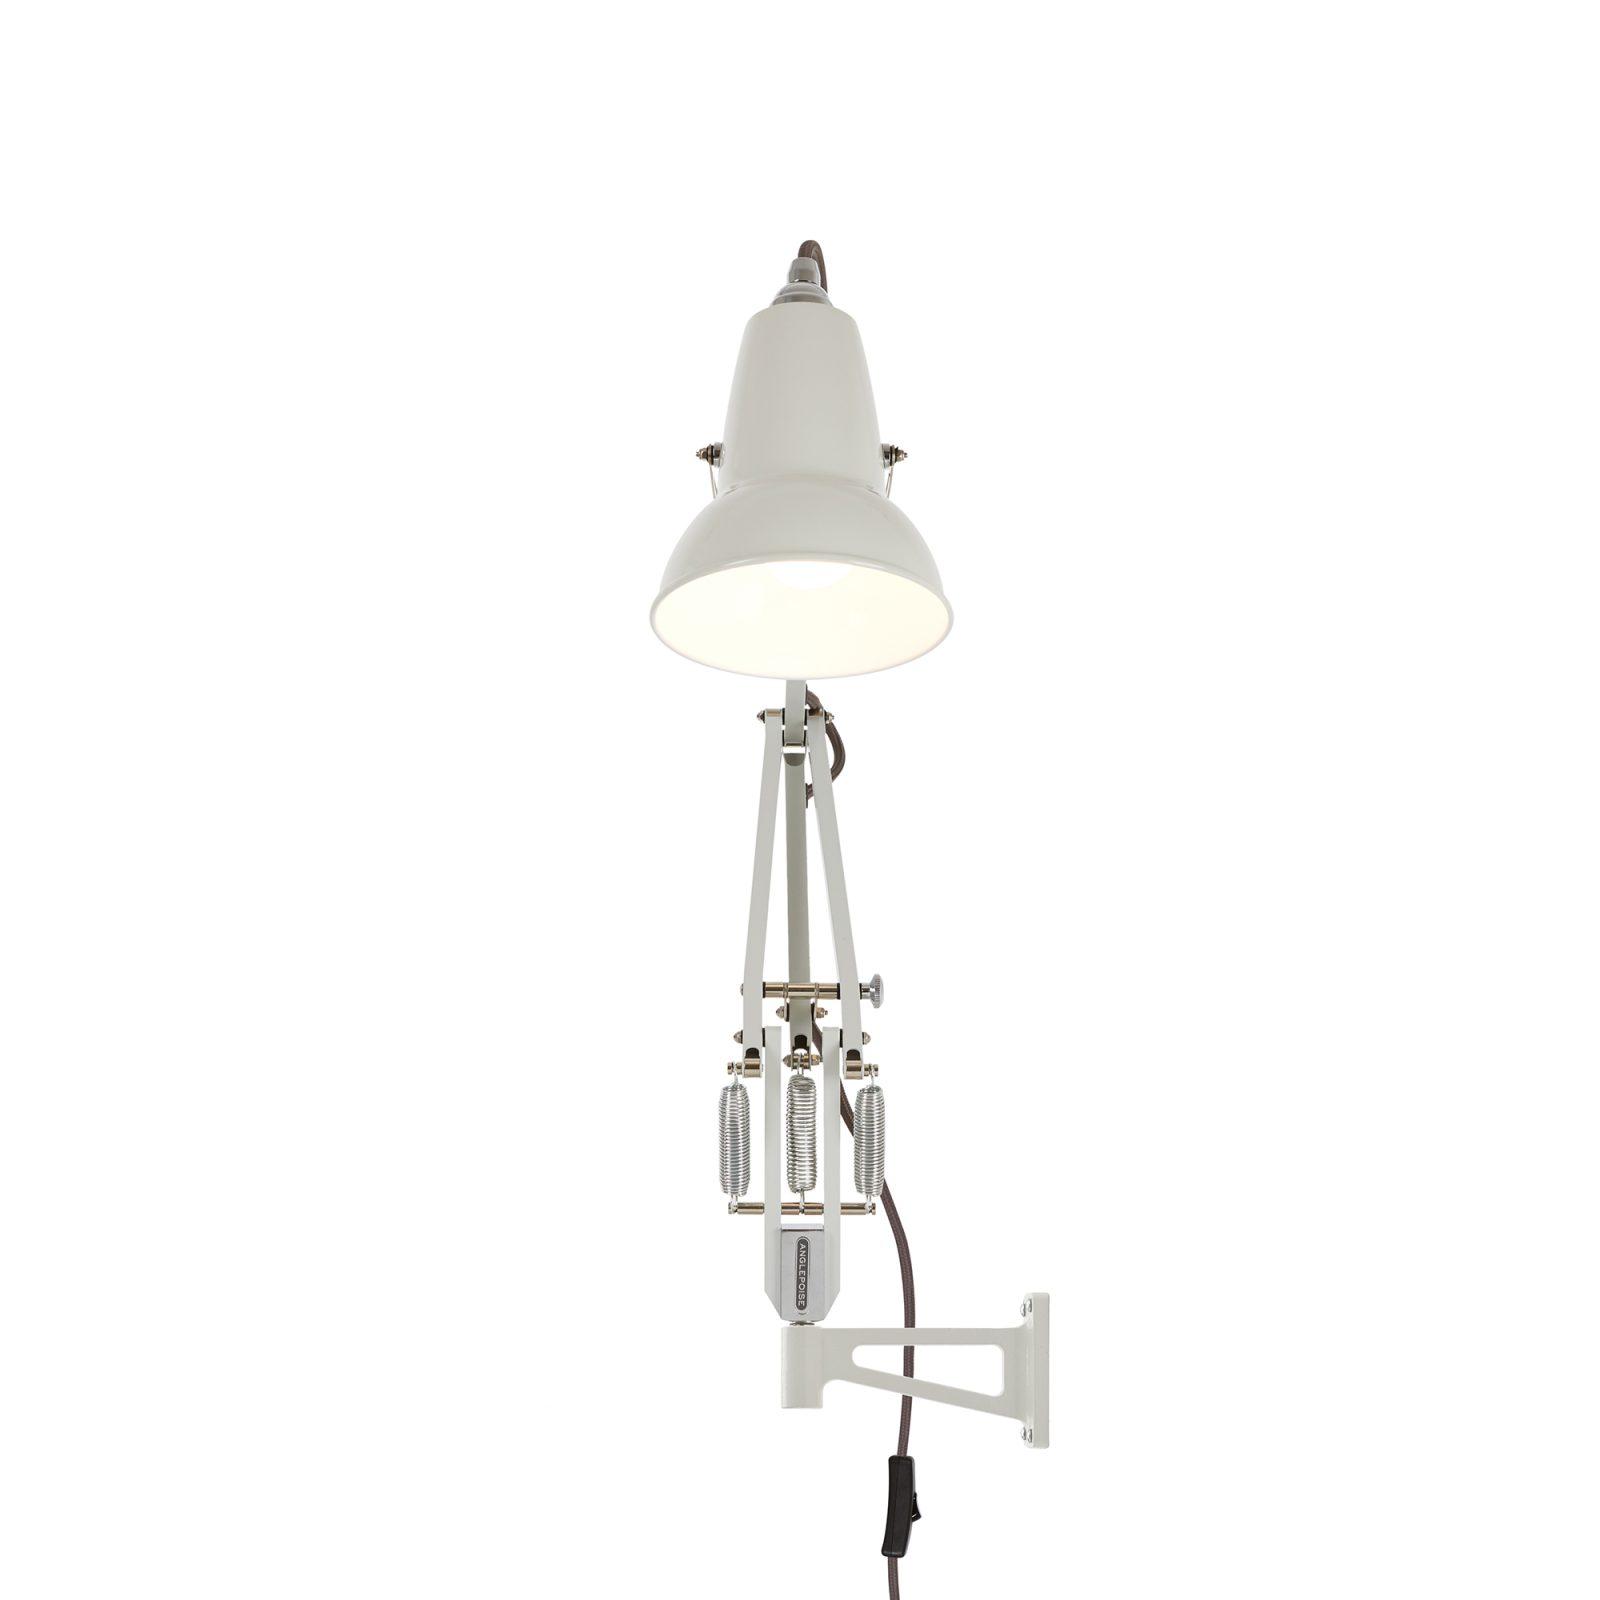 original-1227-mini-lamp-with-wall-bracket-white